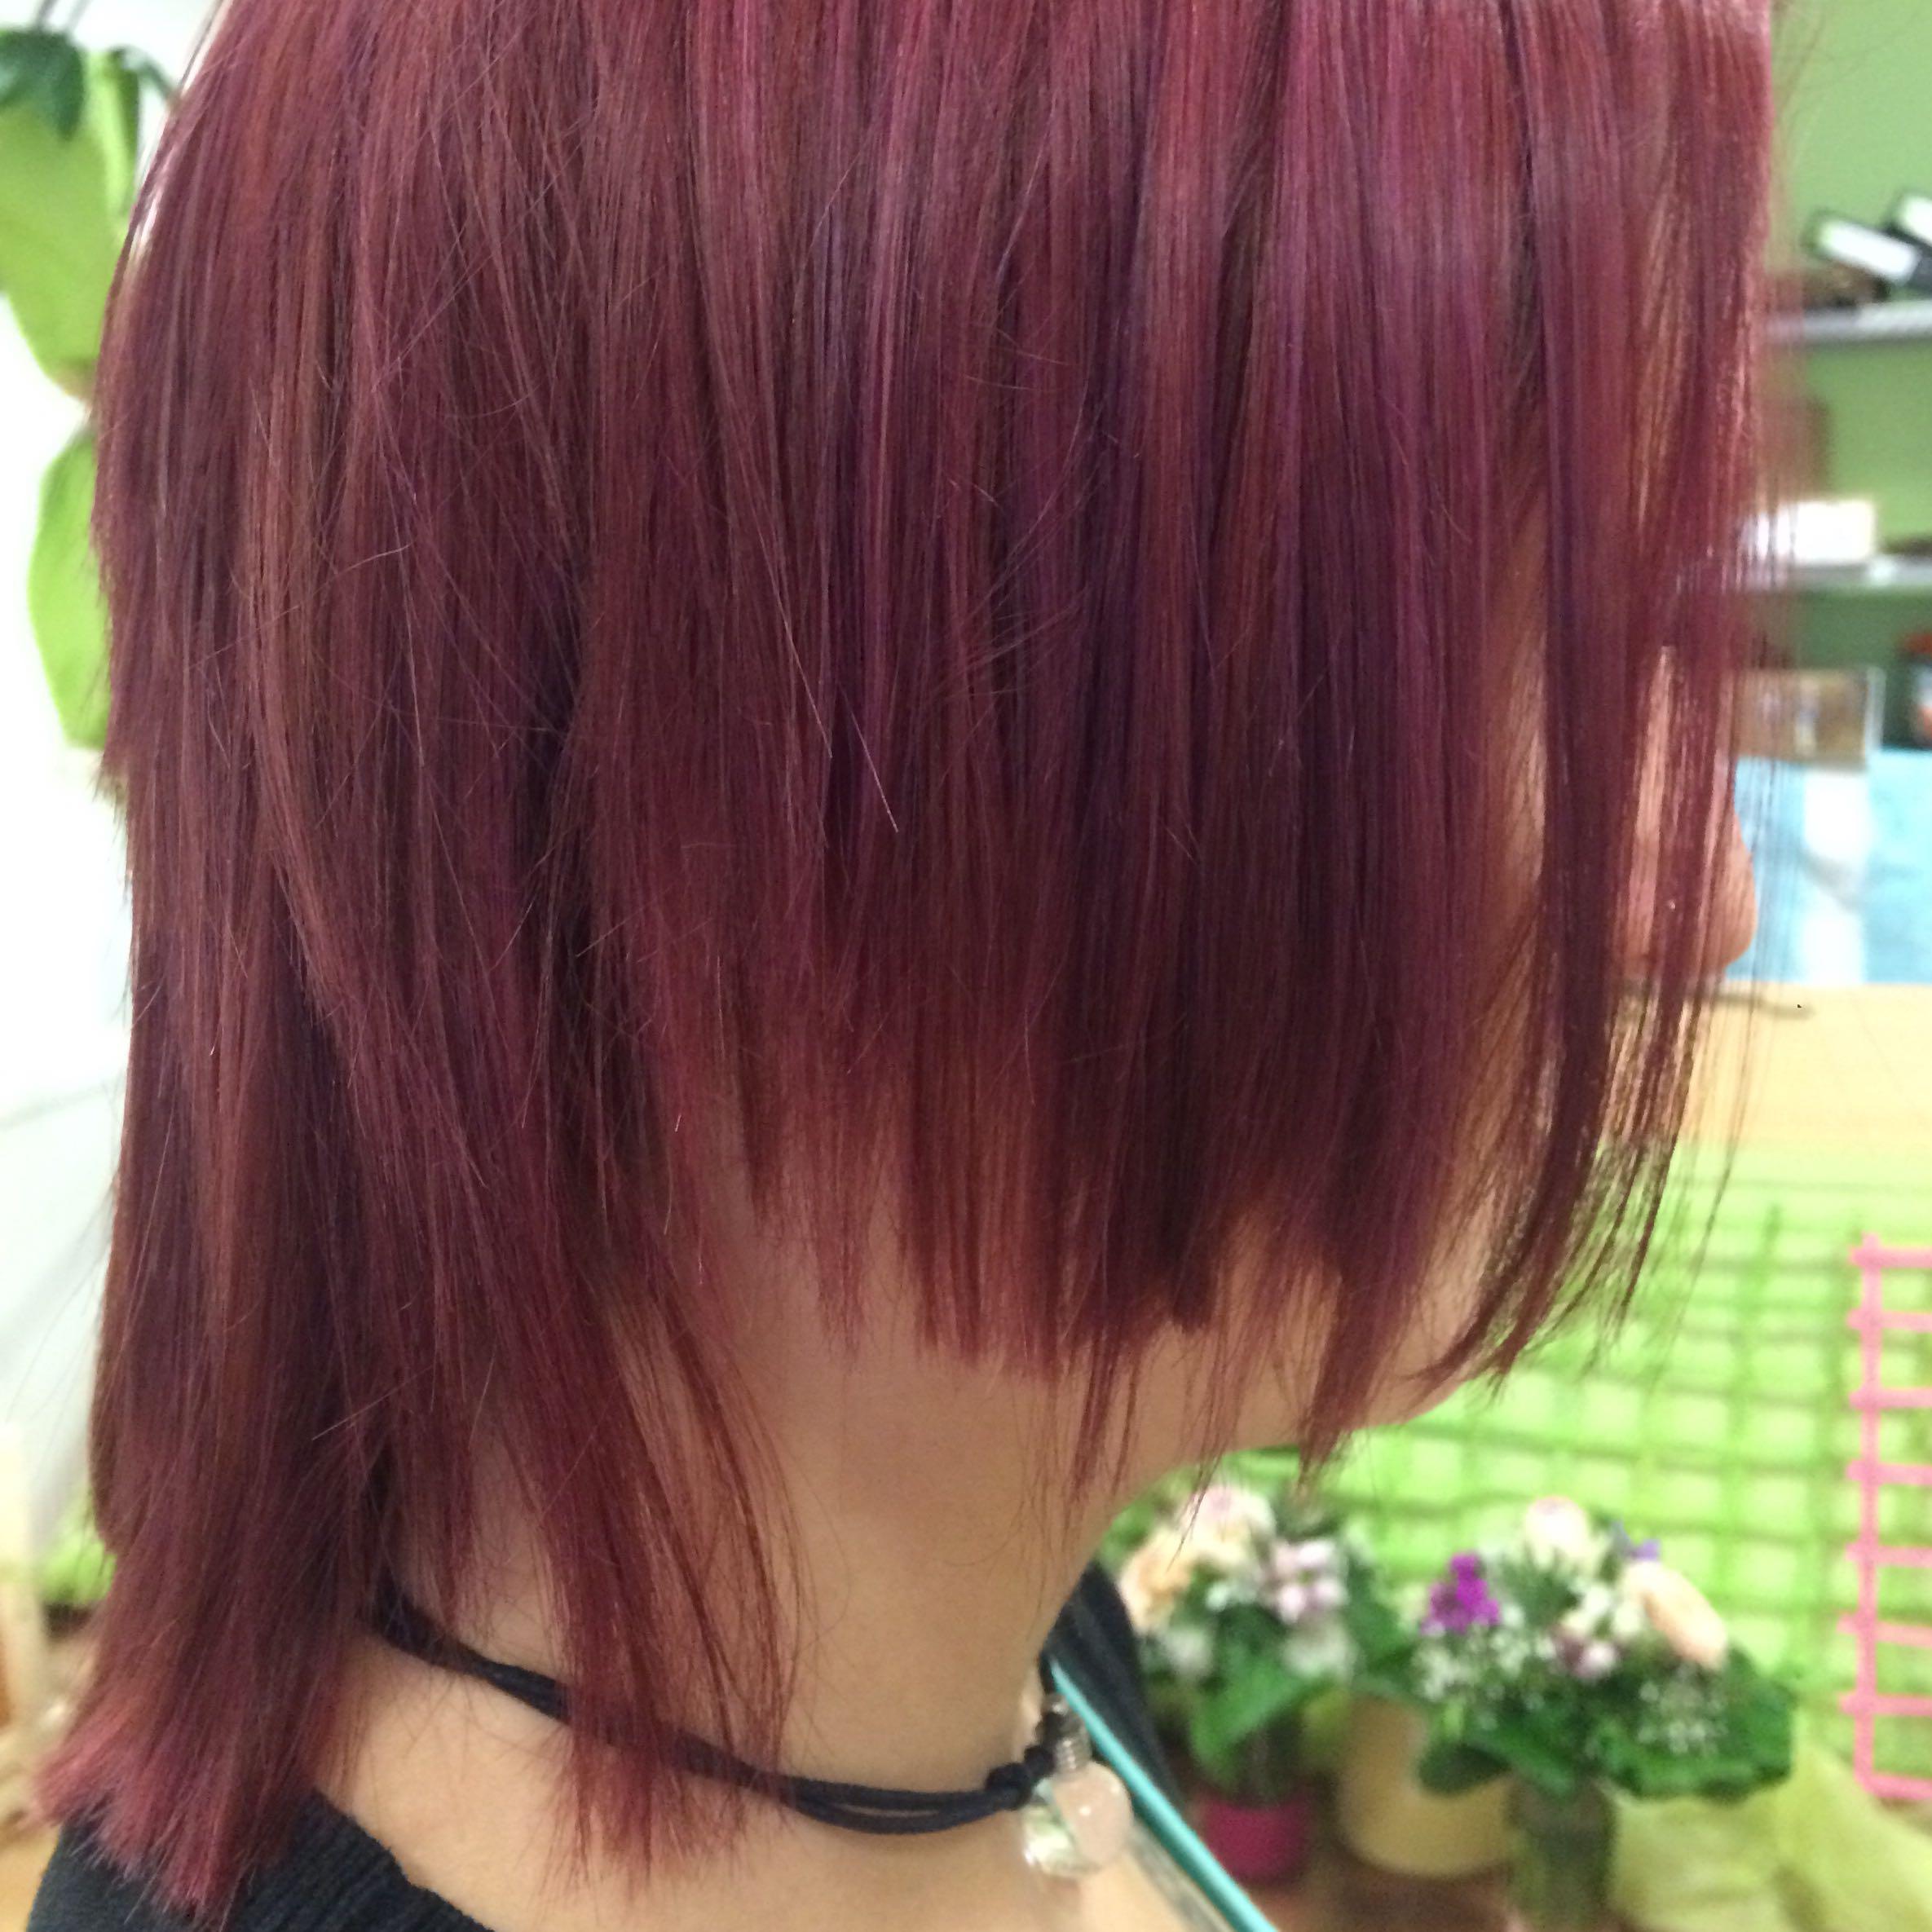 Friseur hat haare zu kurz geschnitten